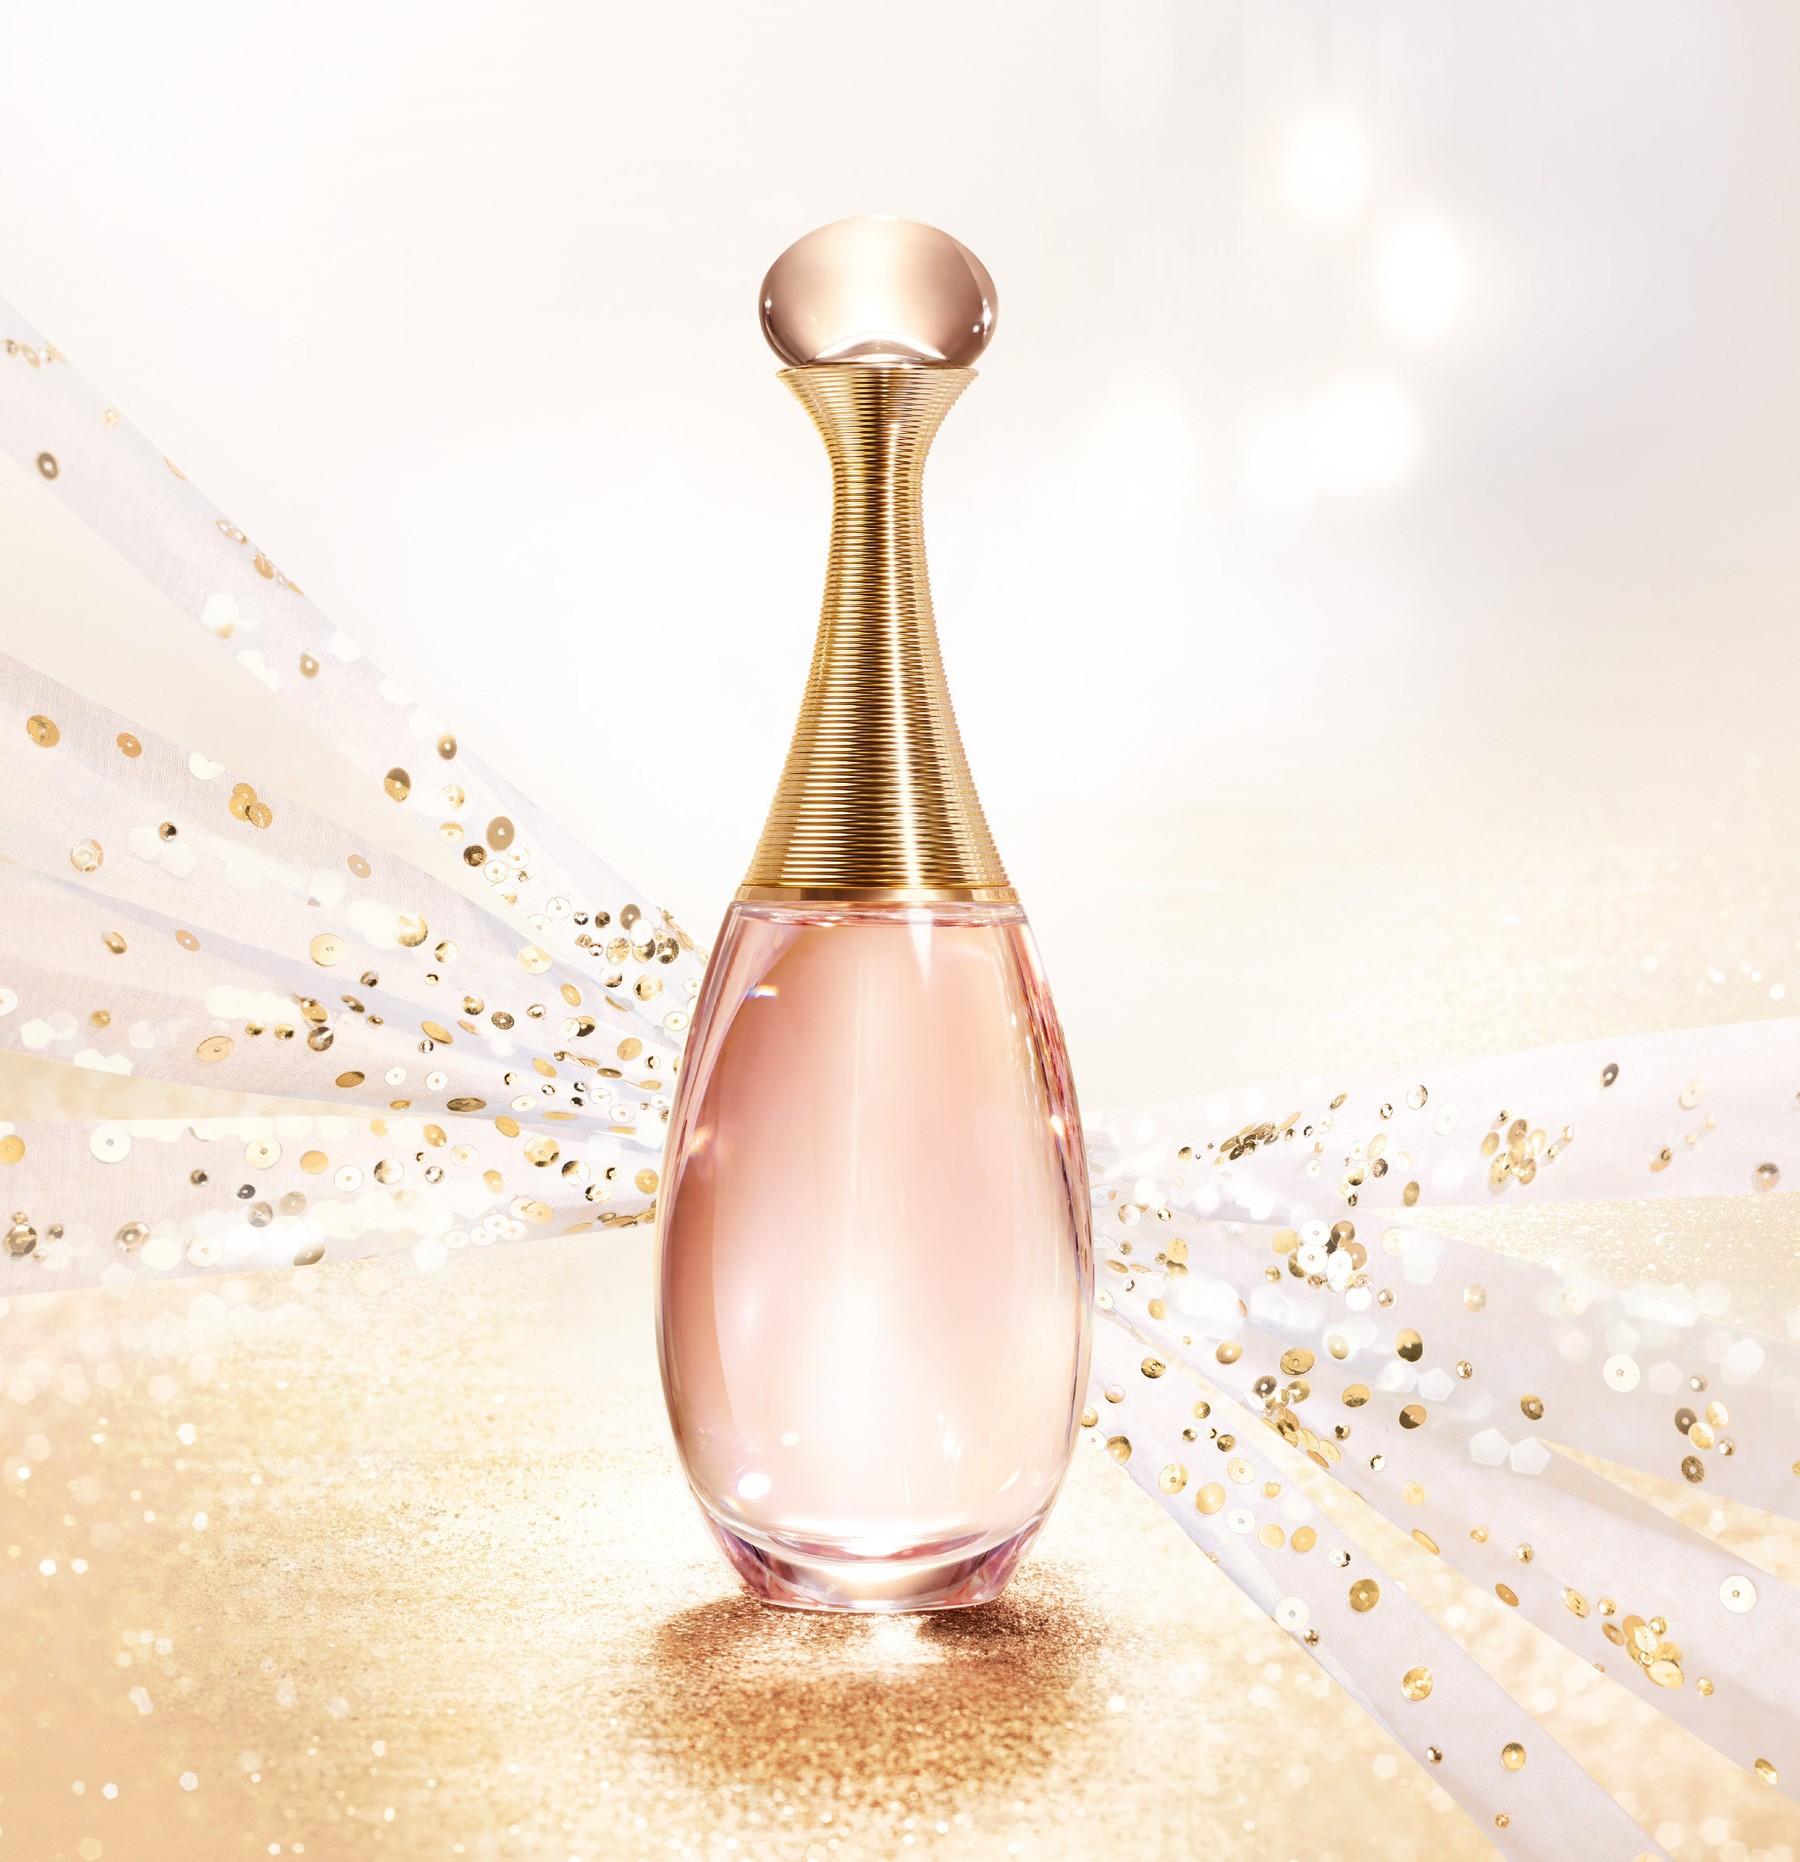 Dior J'adore Lumiere Eau de Toilette аромат для женщин